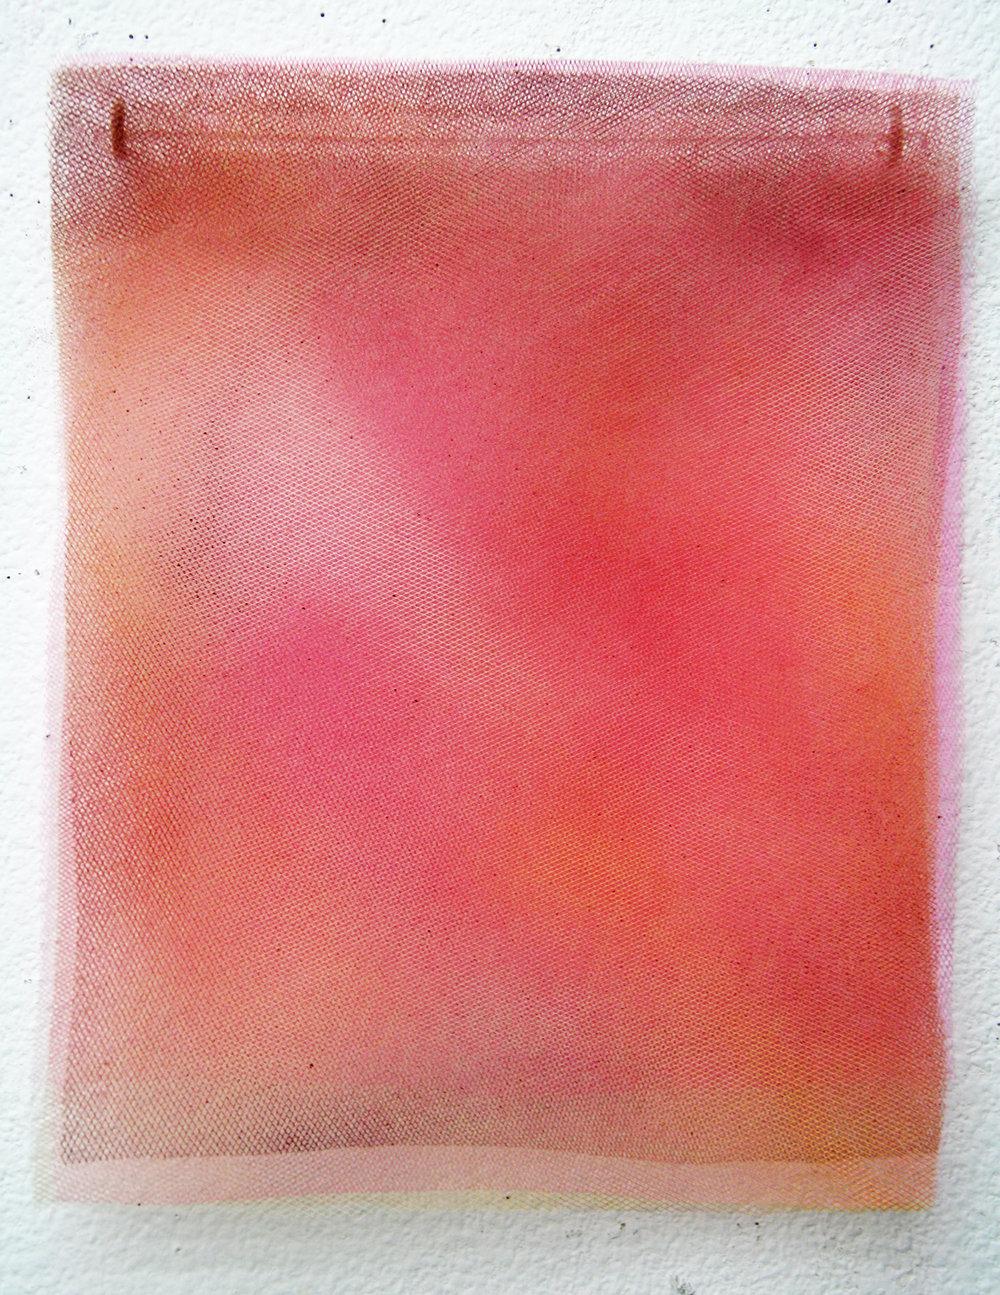 Breslaw,Pink Calm,12.75_x10.25_,layered transparent mesh,paint, 2014,$595.jpg